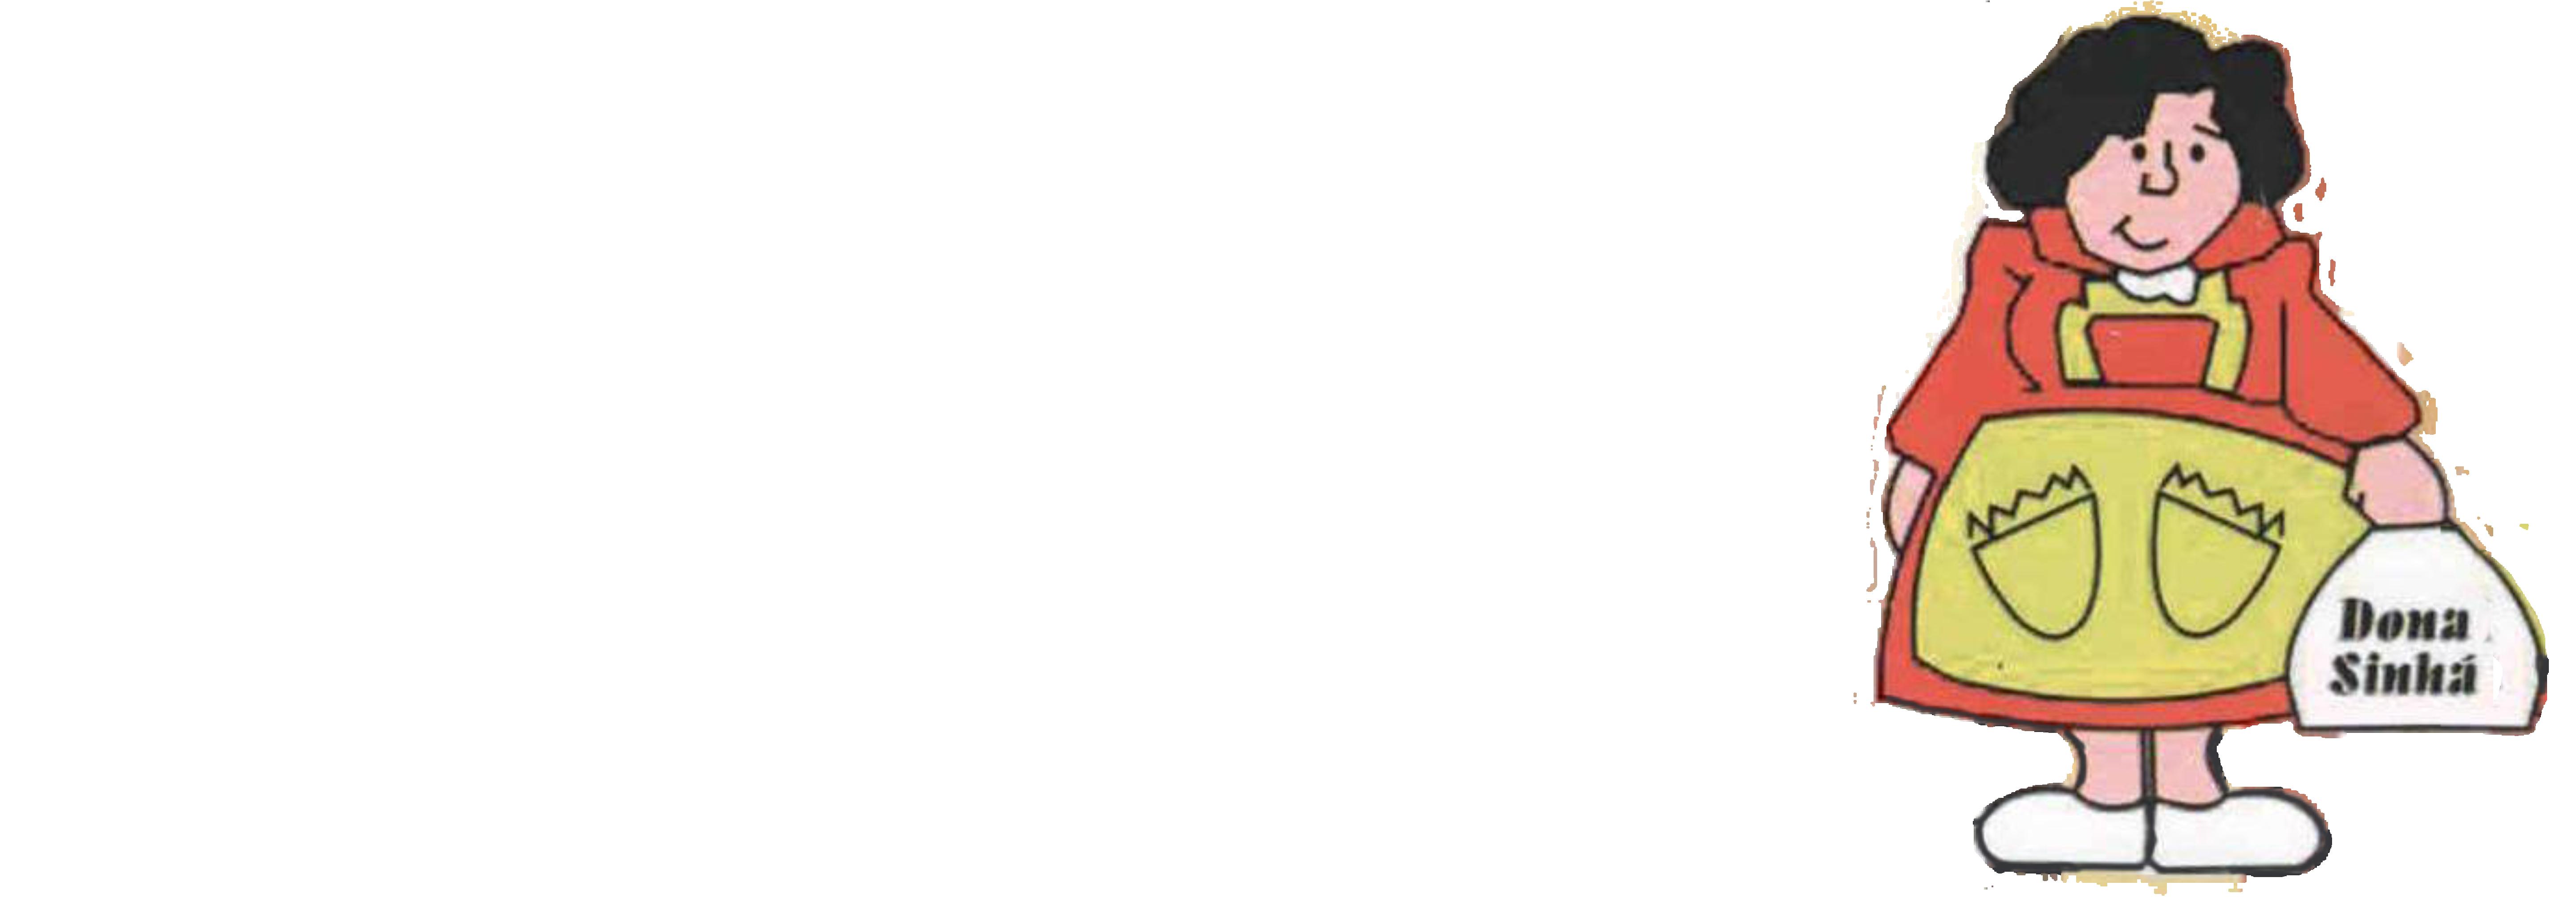 LOGO TEXTIL GUARANÉSIA